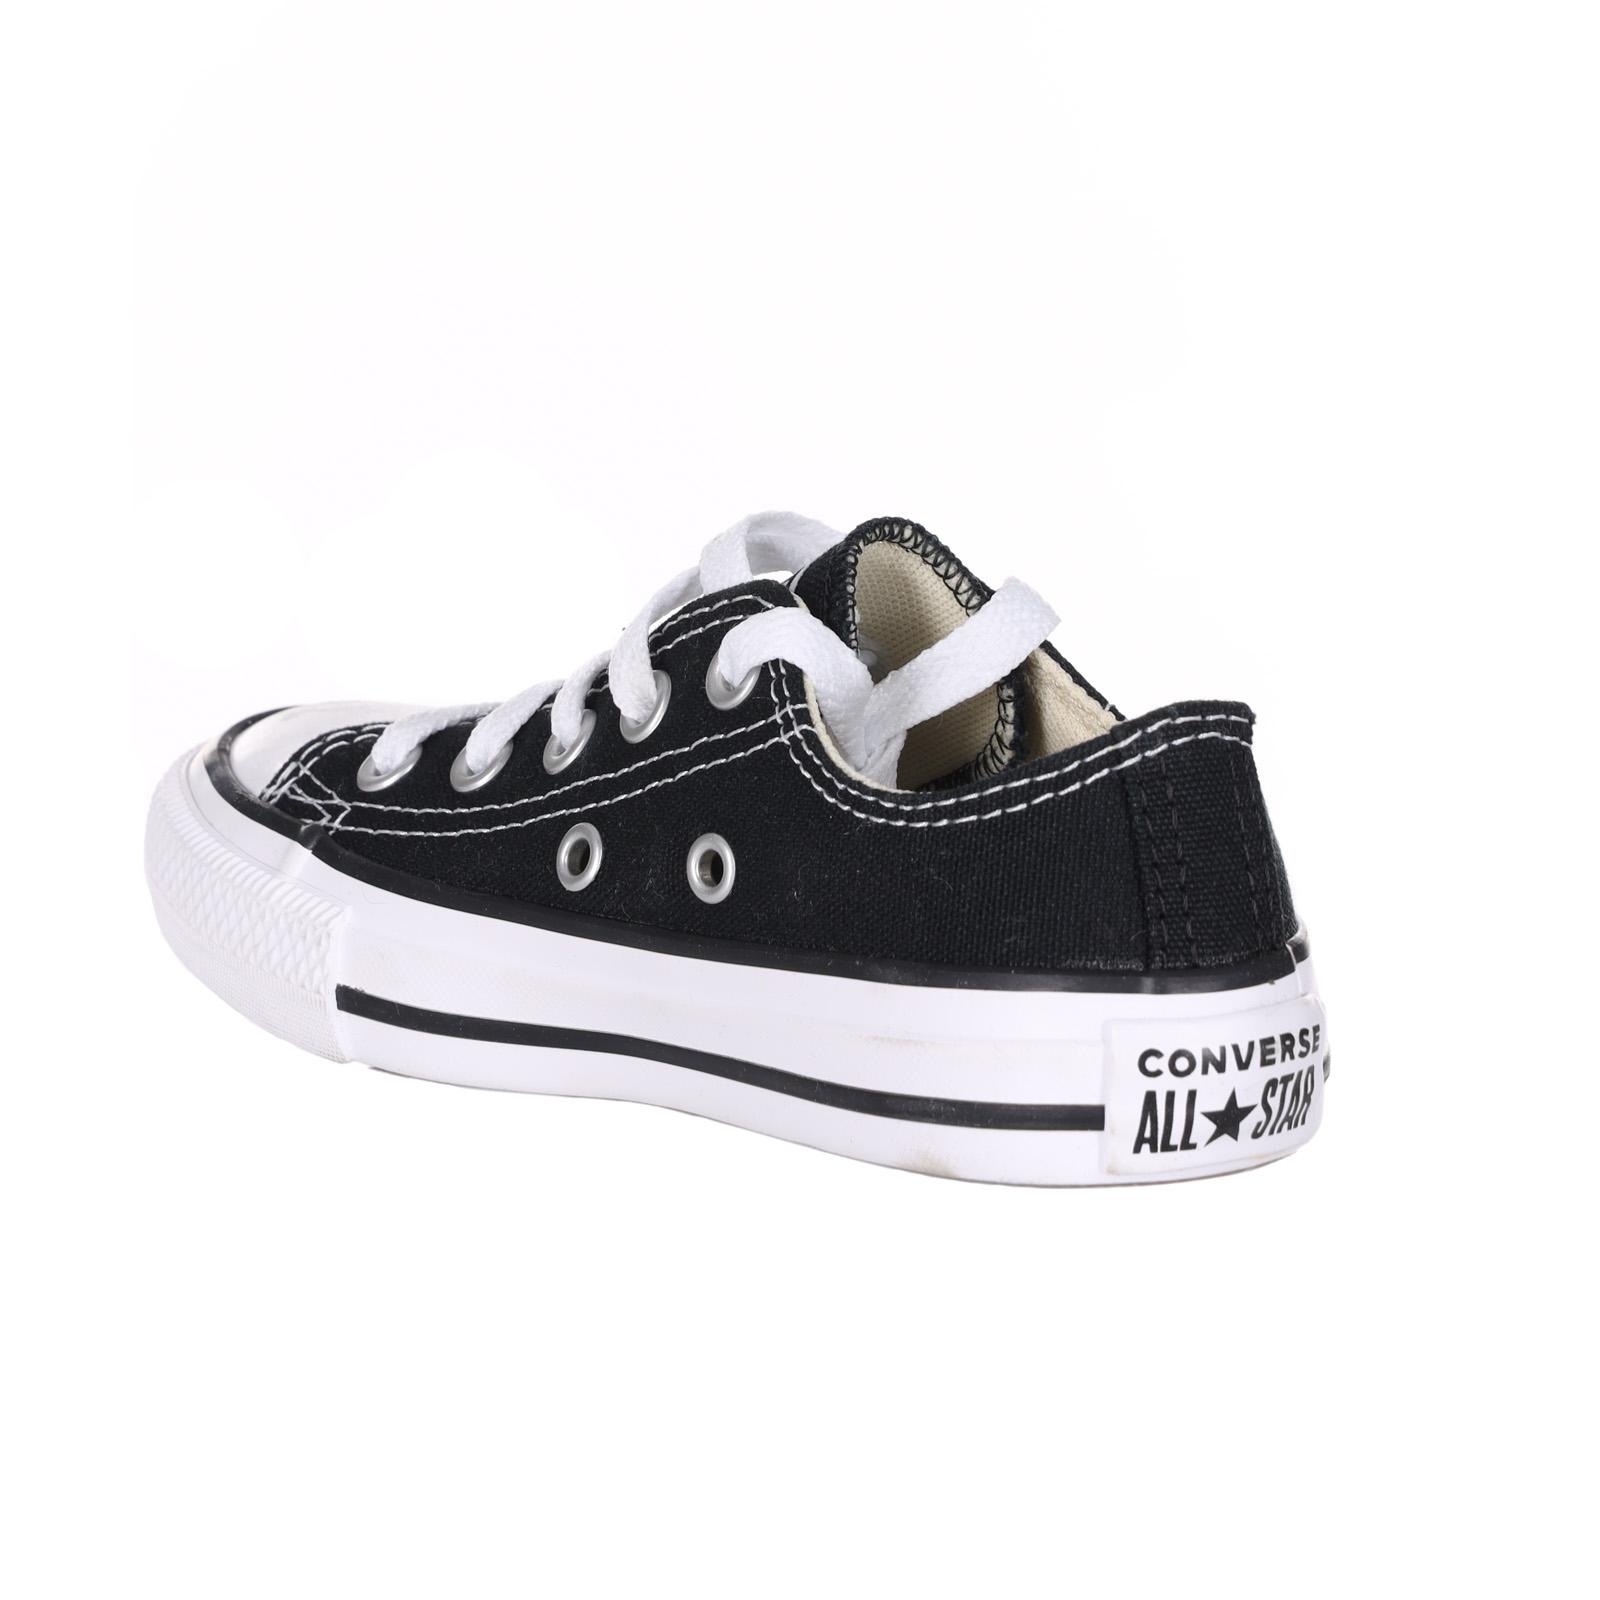 Sneakers bambino/a nere Converse con taglio basso - CONVERSE - Pavidas